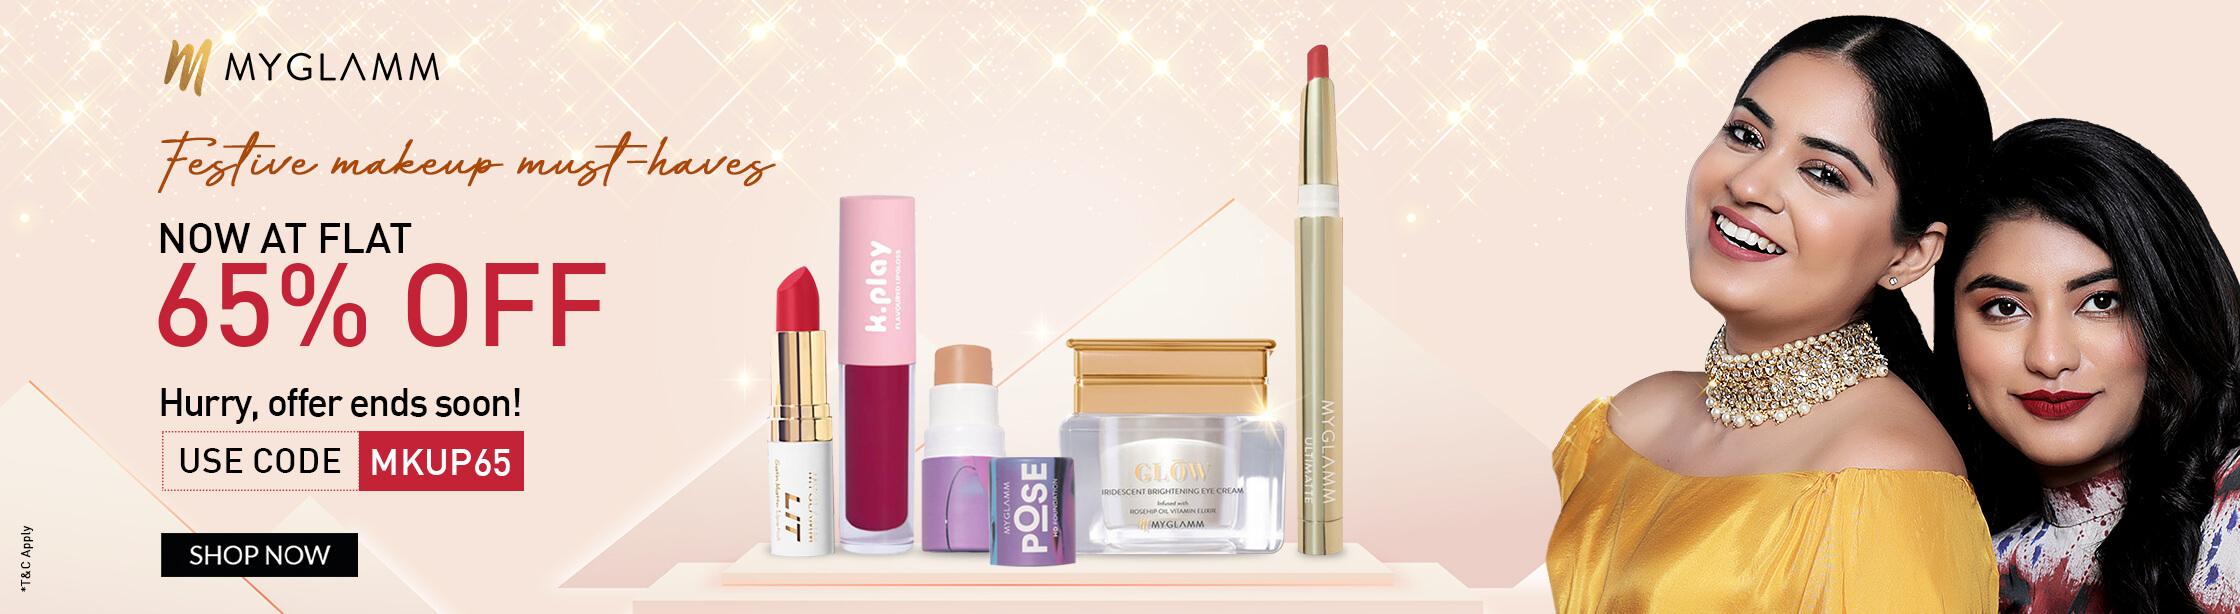 Makeup Category Sleek Banner